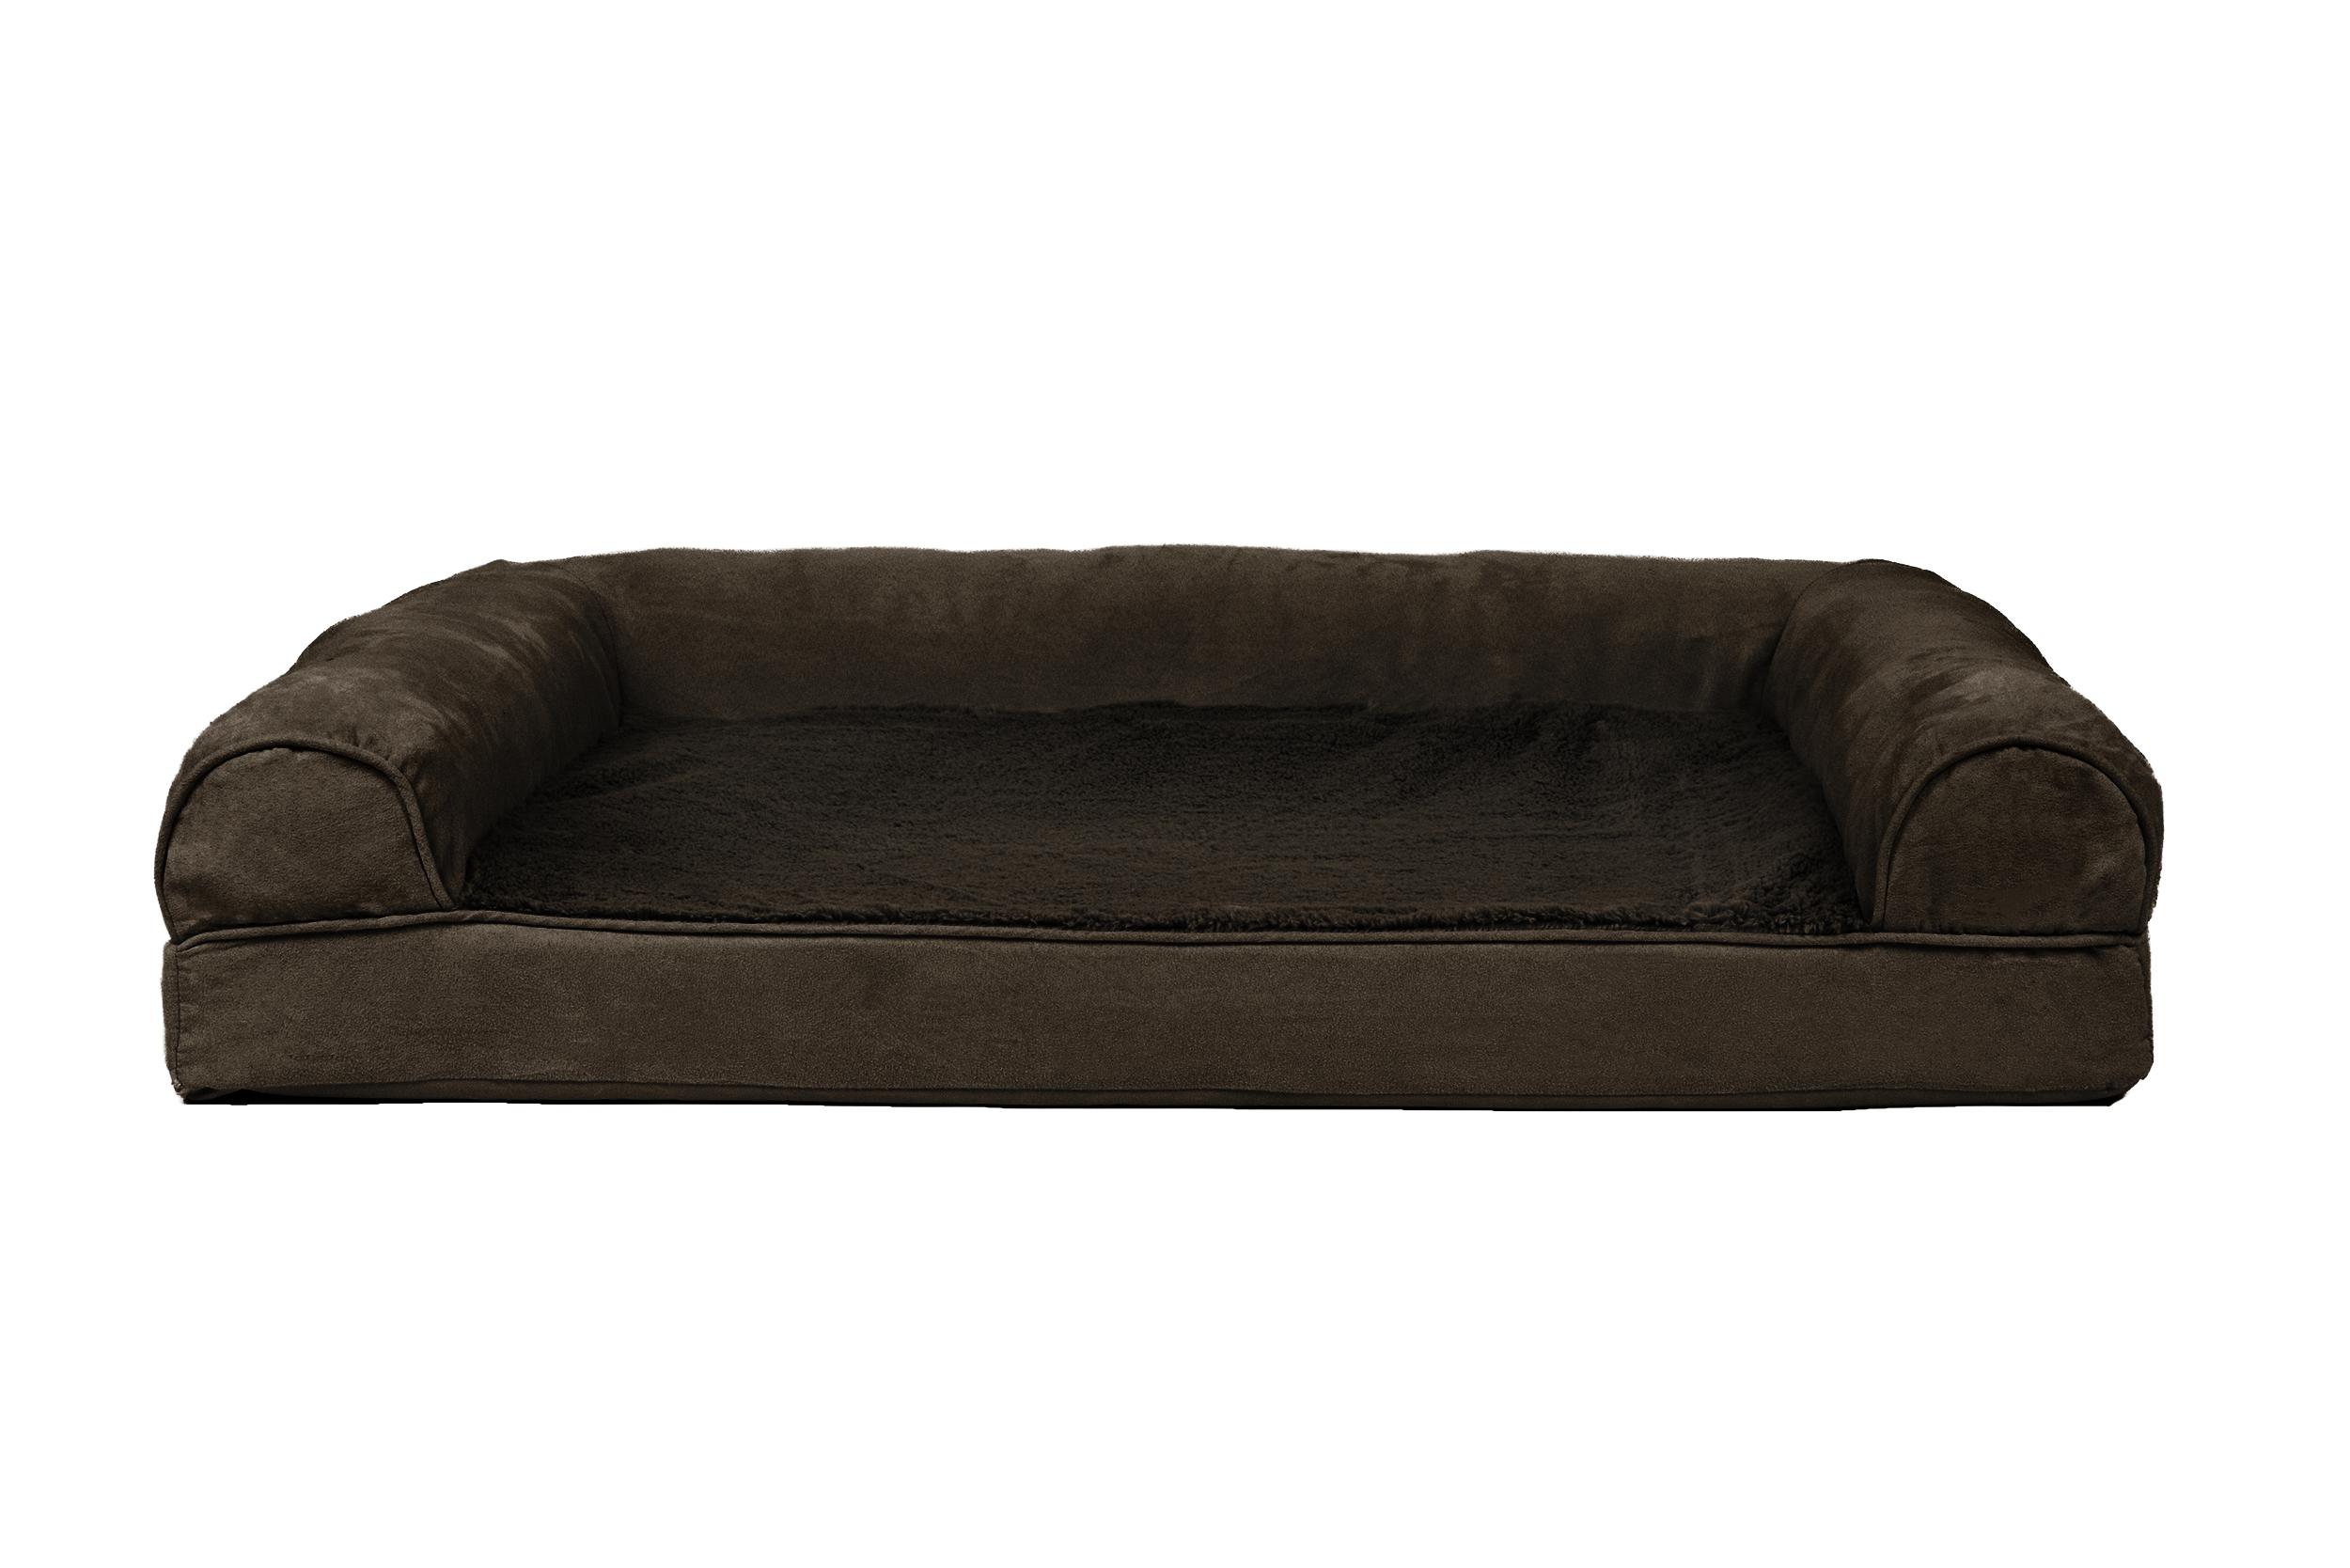 FurHaven Plush Amp Suede Orthopedic Sofa Dog Bed